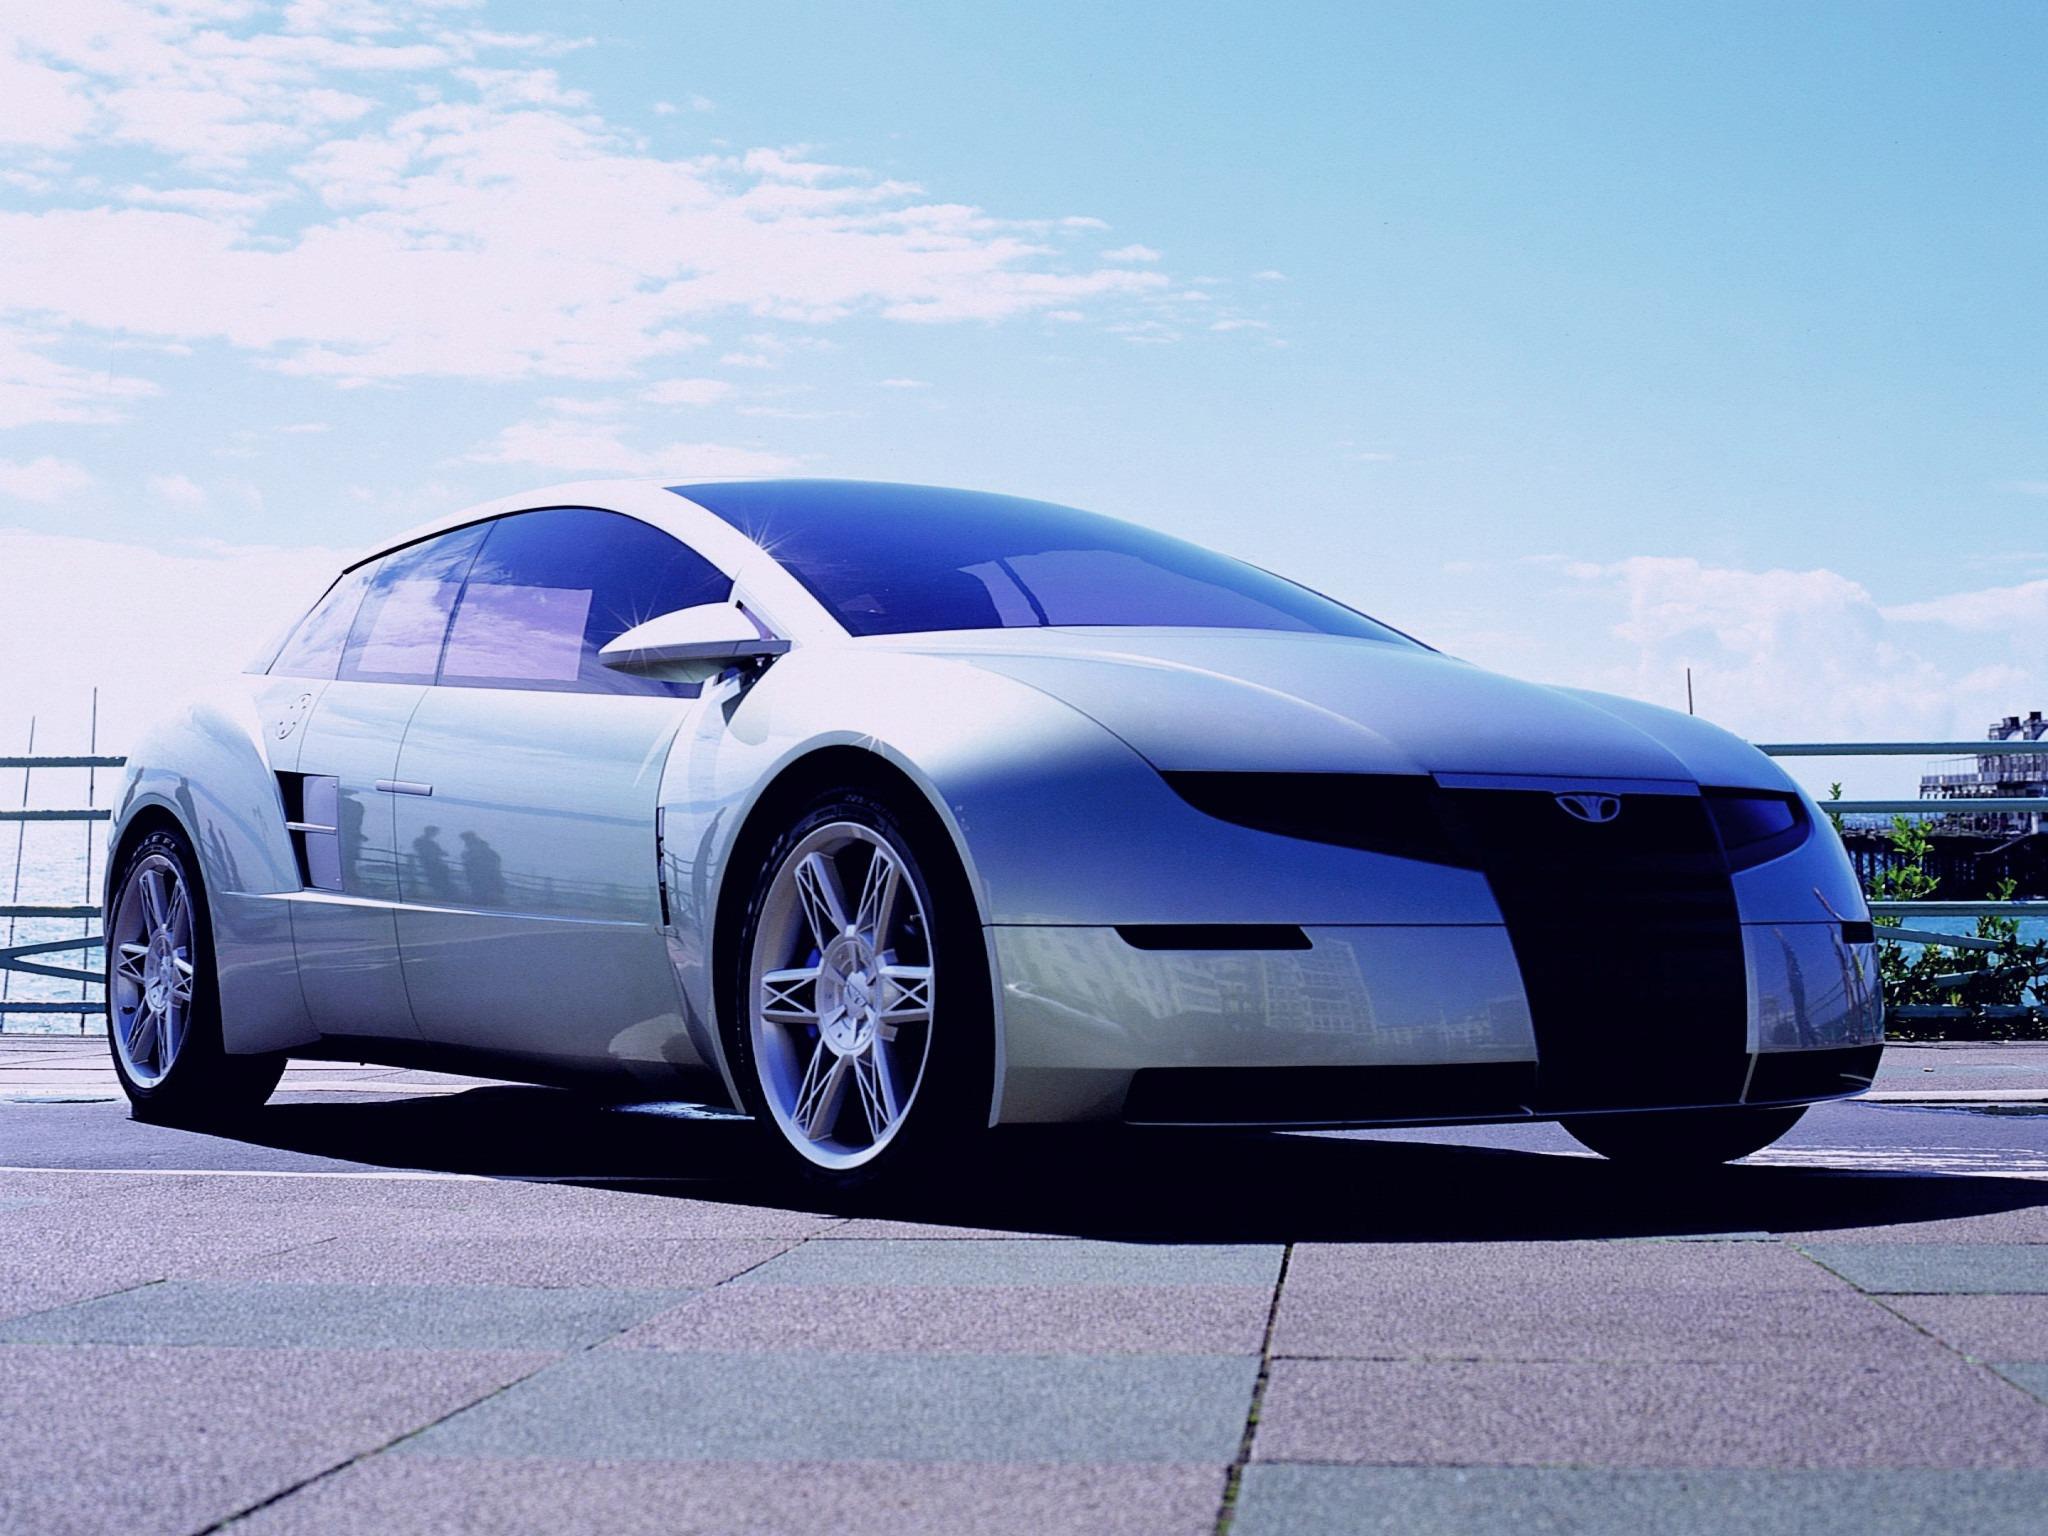 daewoo mirae concept 1999 old concept cars. Black Bedroom Furniture Sets. Home Design Ideas